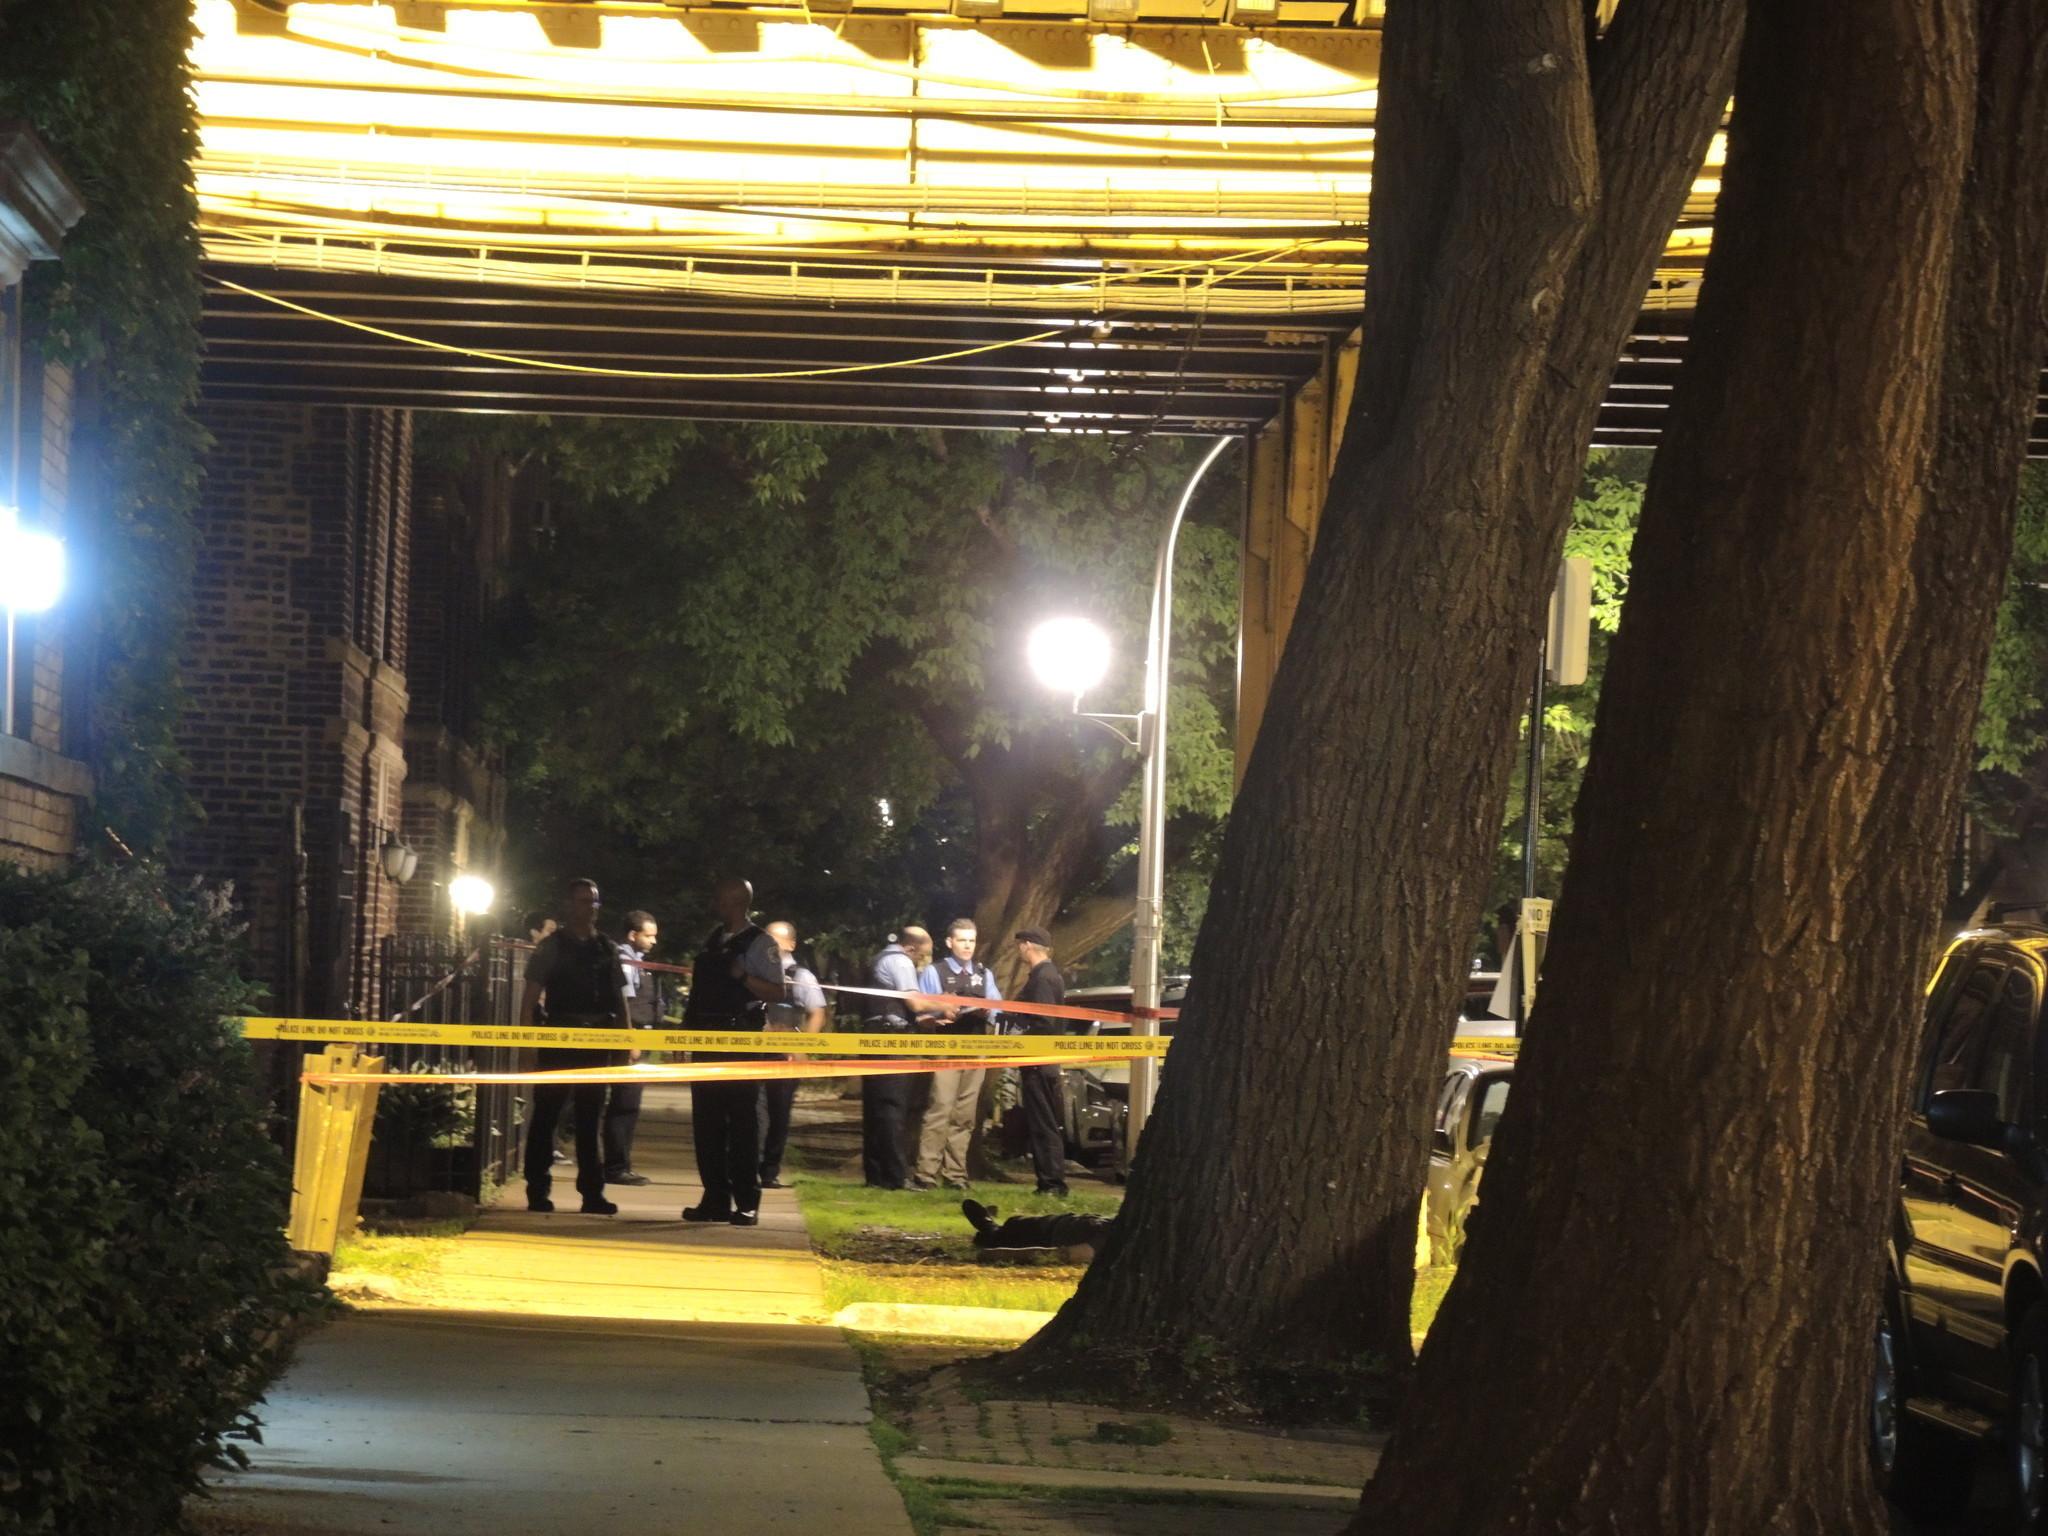 2 dead, 16 hurt in city shootings